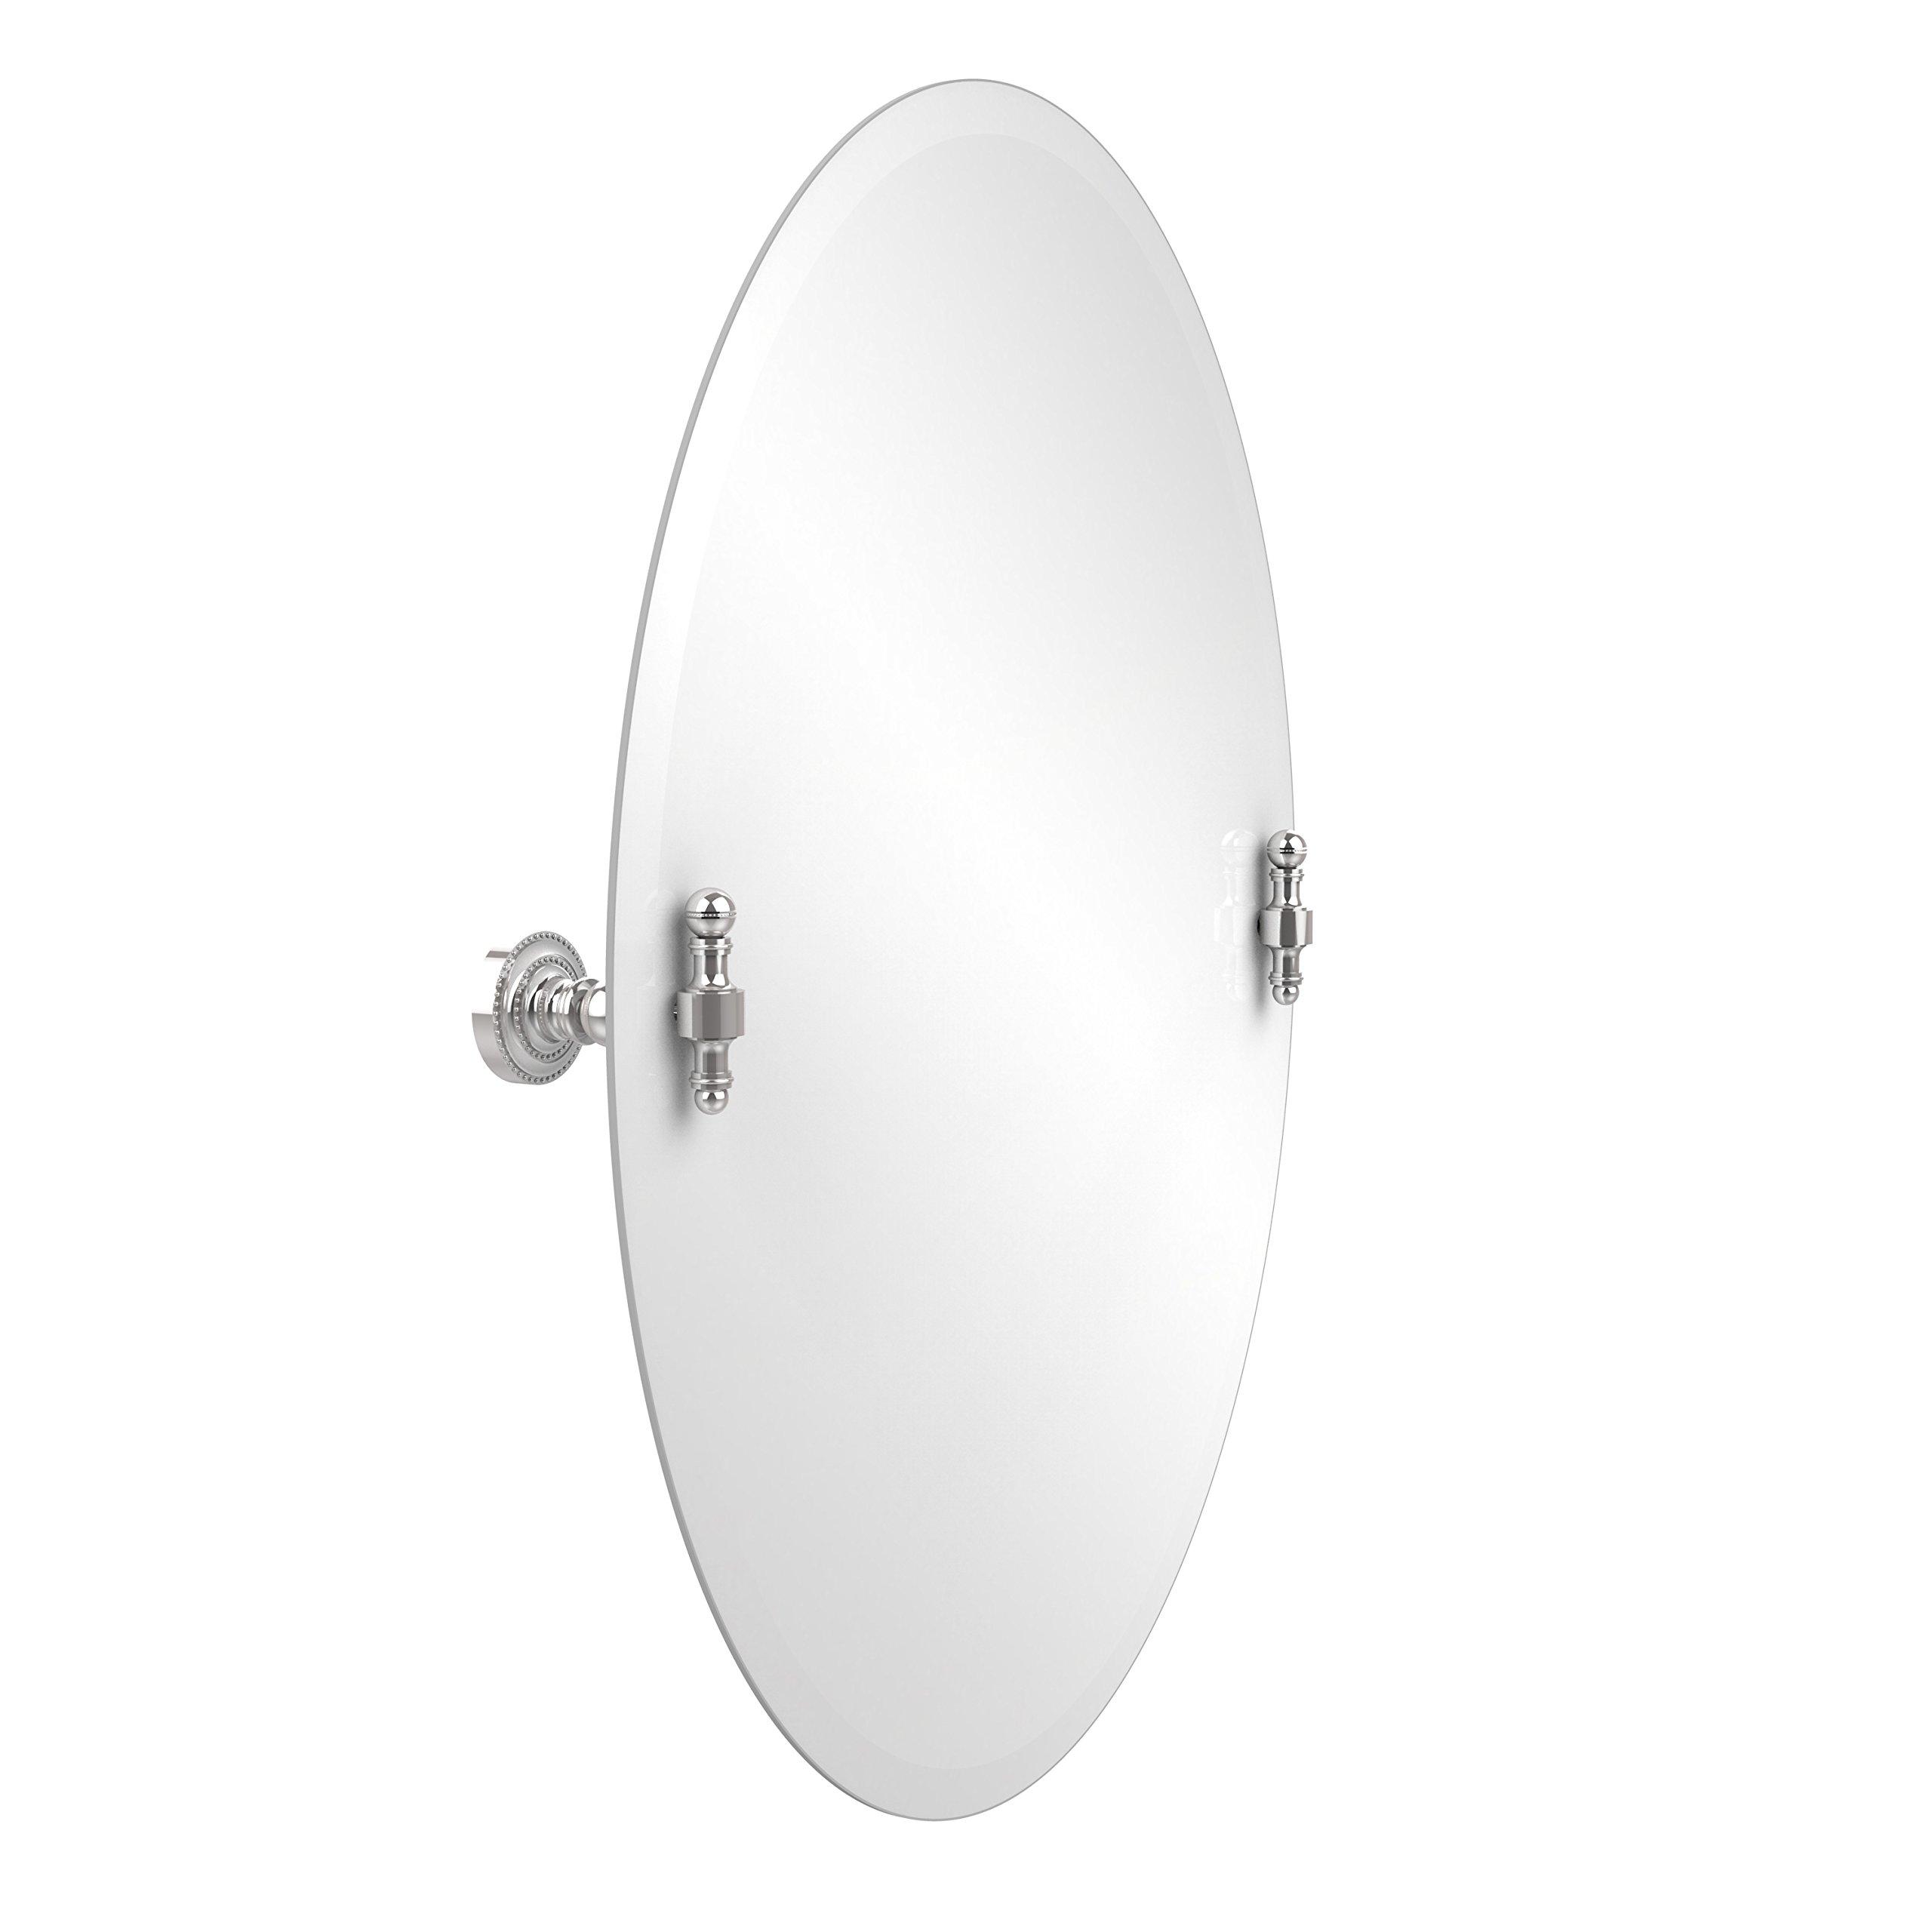 Allied Brass RD-91-PC 21-Inchx29-Inch Oval Tilt Mirror, Polished Chrome